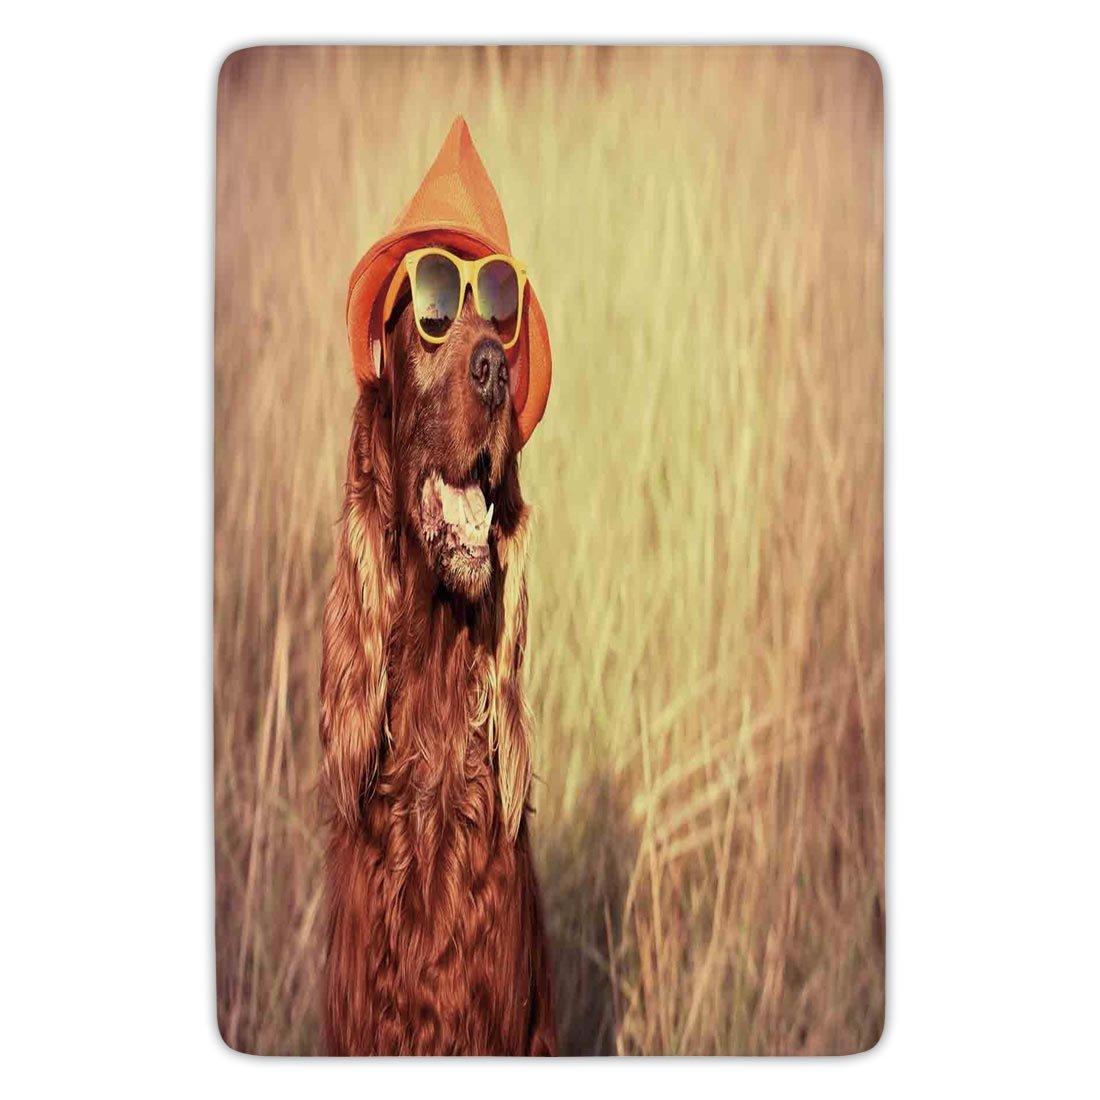 Bathroom Bath Rug Kitchen Floor Mat Carpet,Animal Decor,Funny Retro Irish Setter Dog Wearing Hat and Sunglasses Humor Joy Picture,Redbrown Tan,Flannel Microfiber Non-slip Soft Absorbent